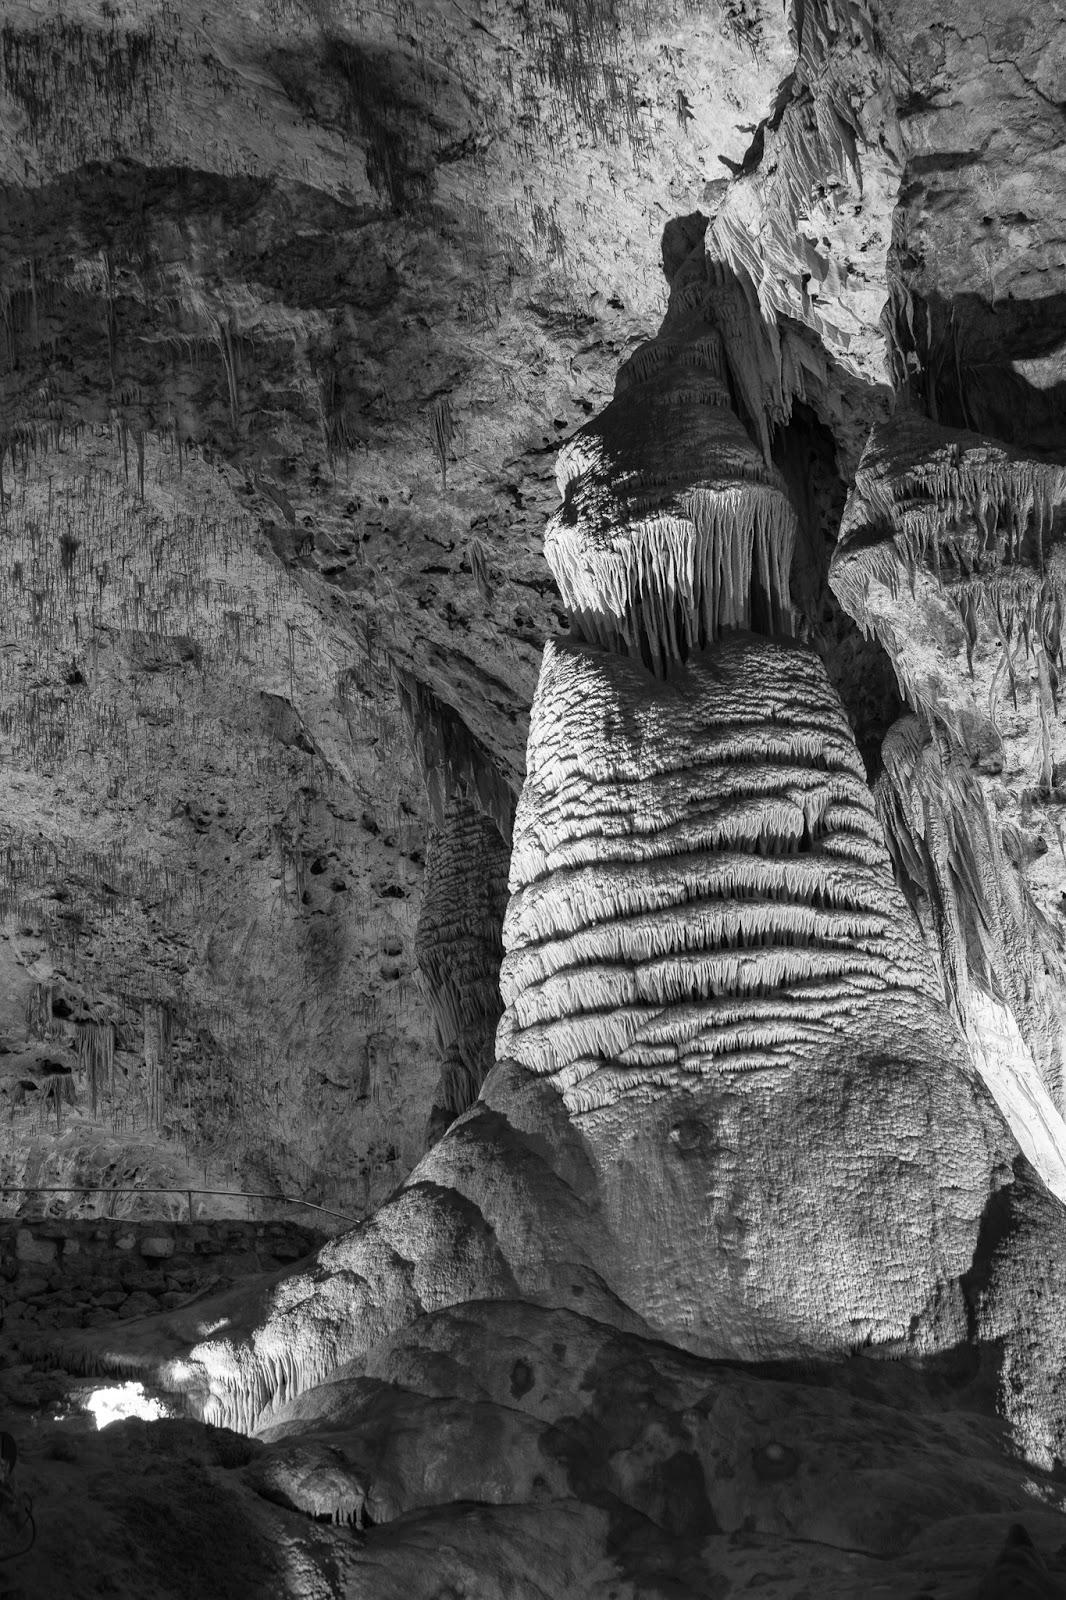 Rock of Ages, Big Room, Carlsbad Caverns